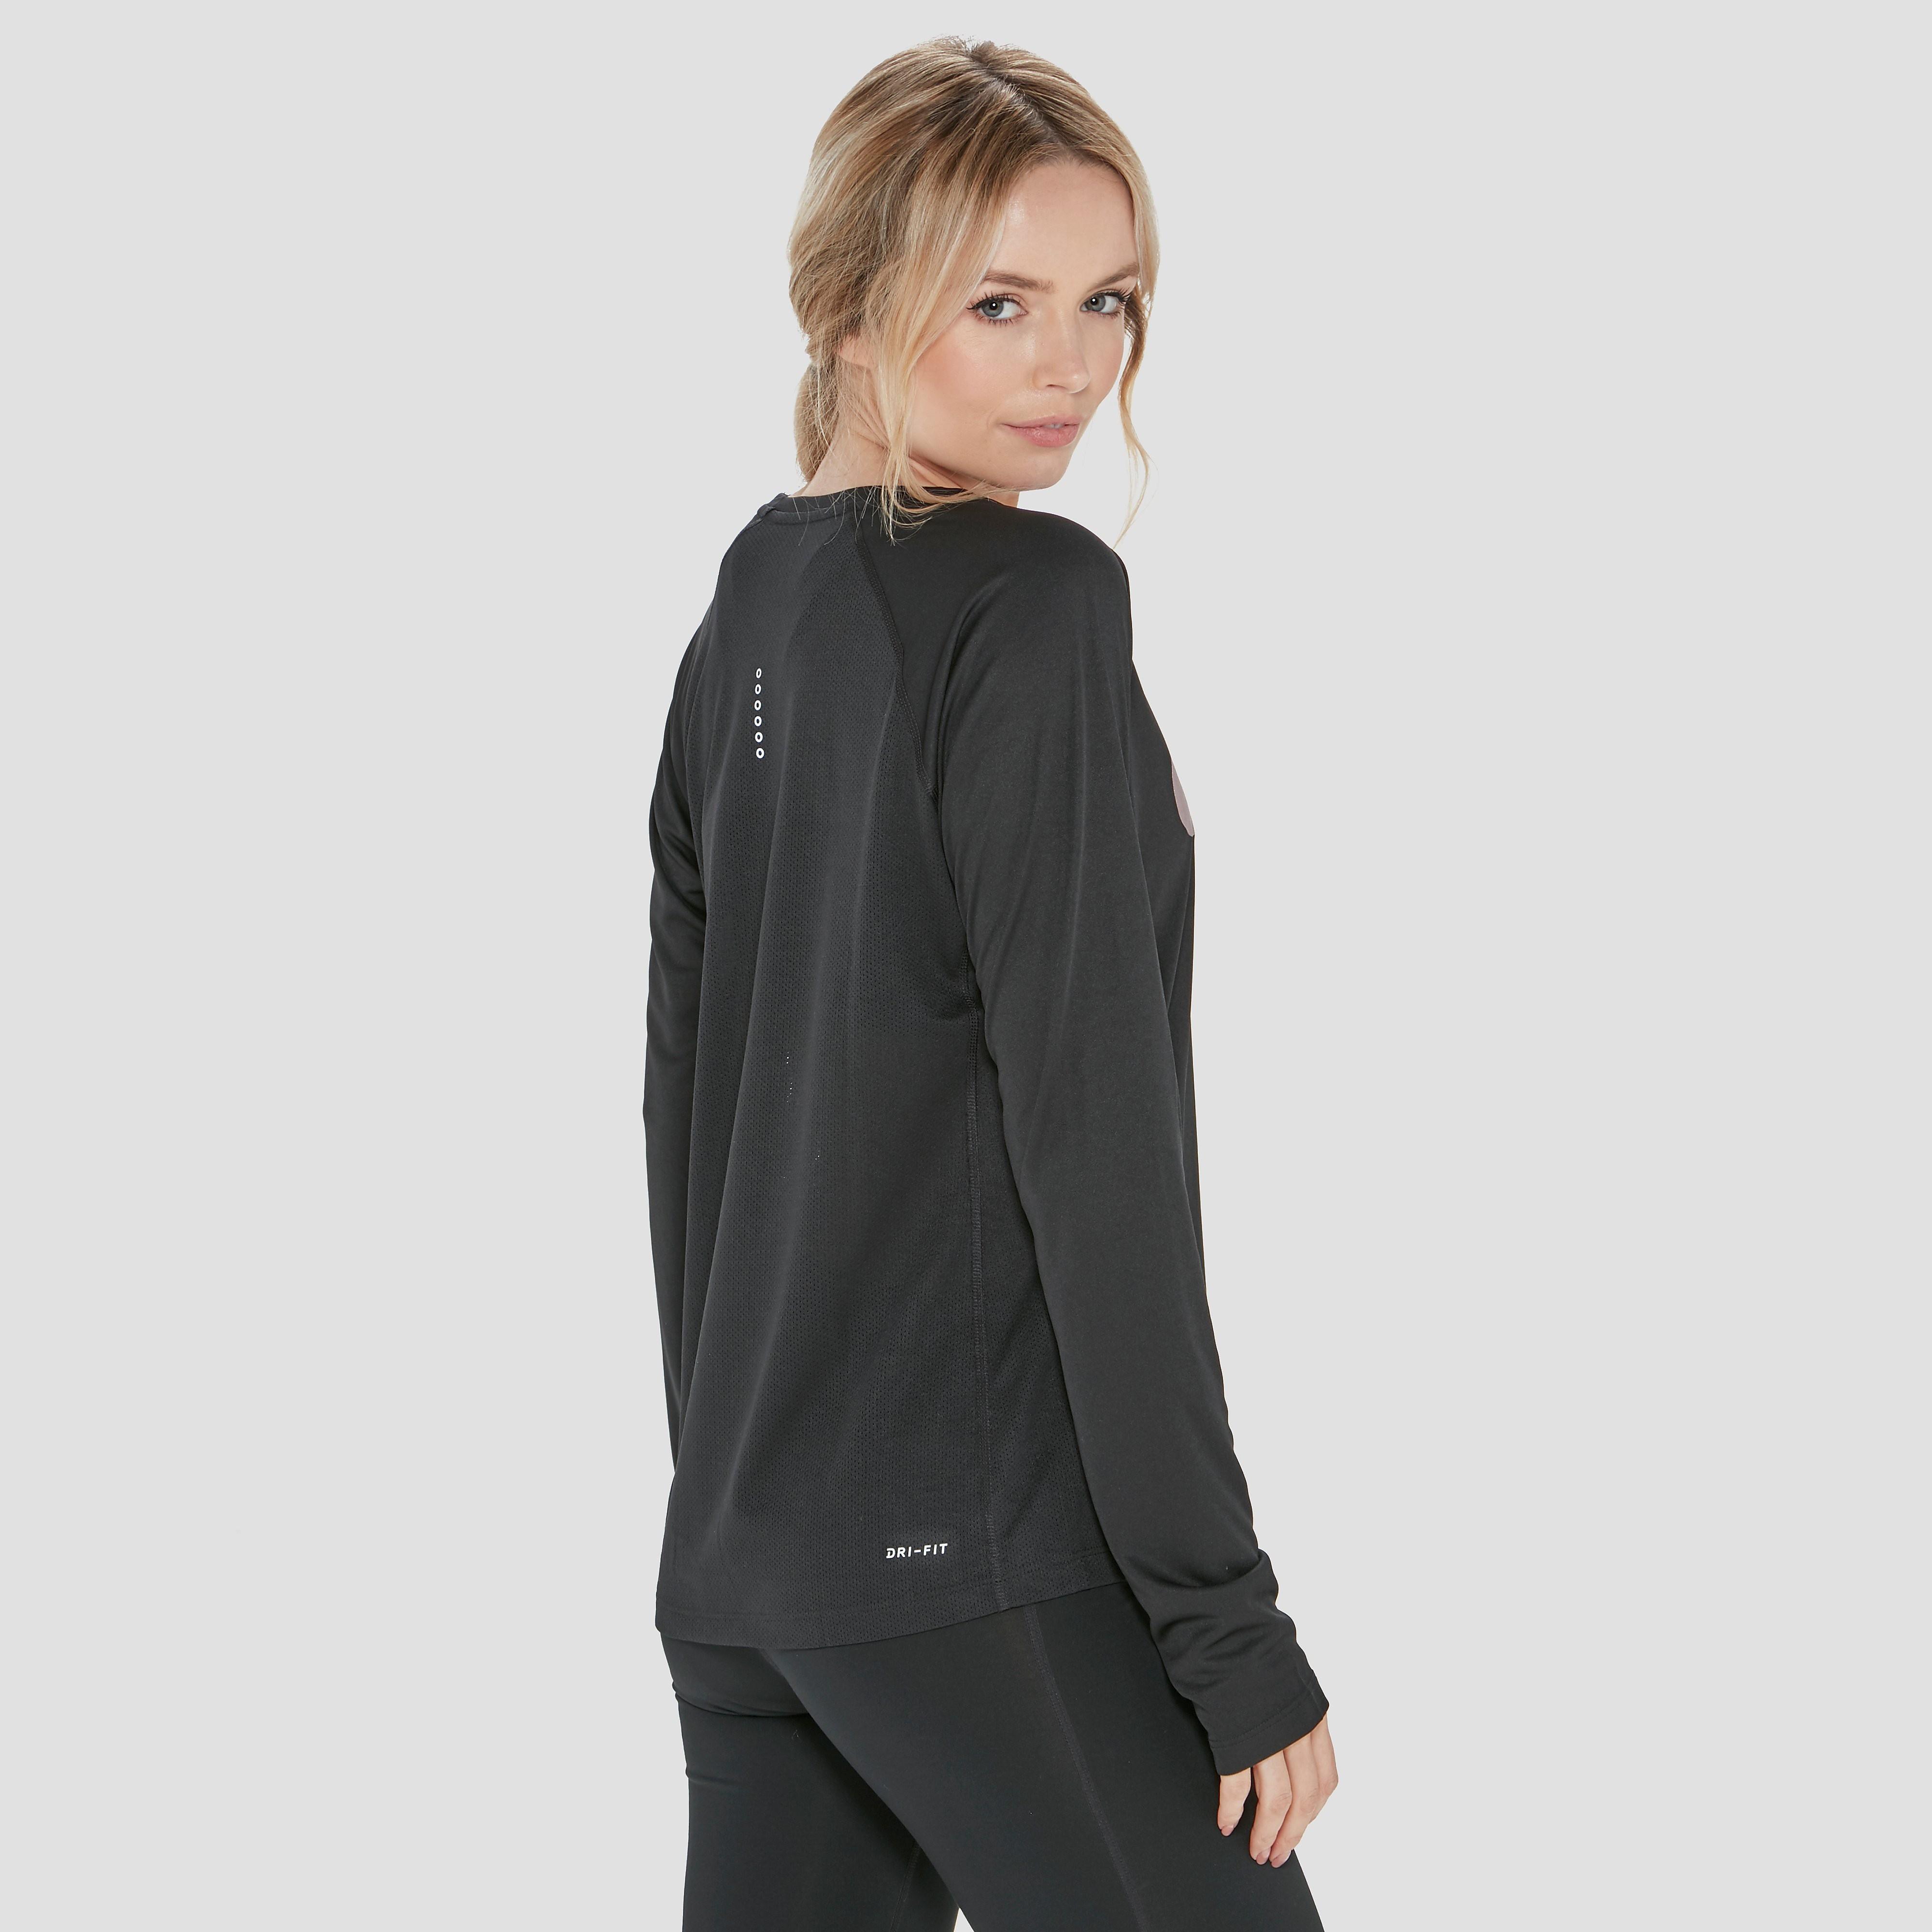 Nike Swoosh Long Sleeved Women's Top